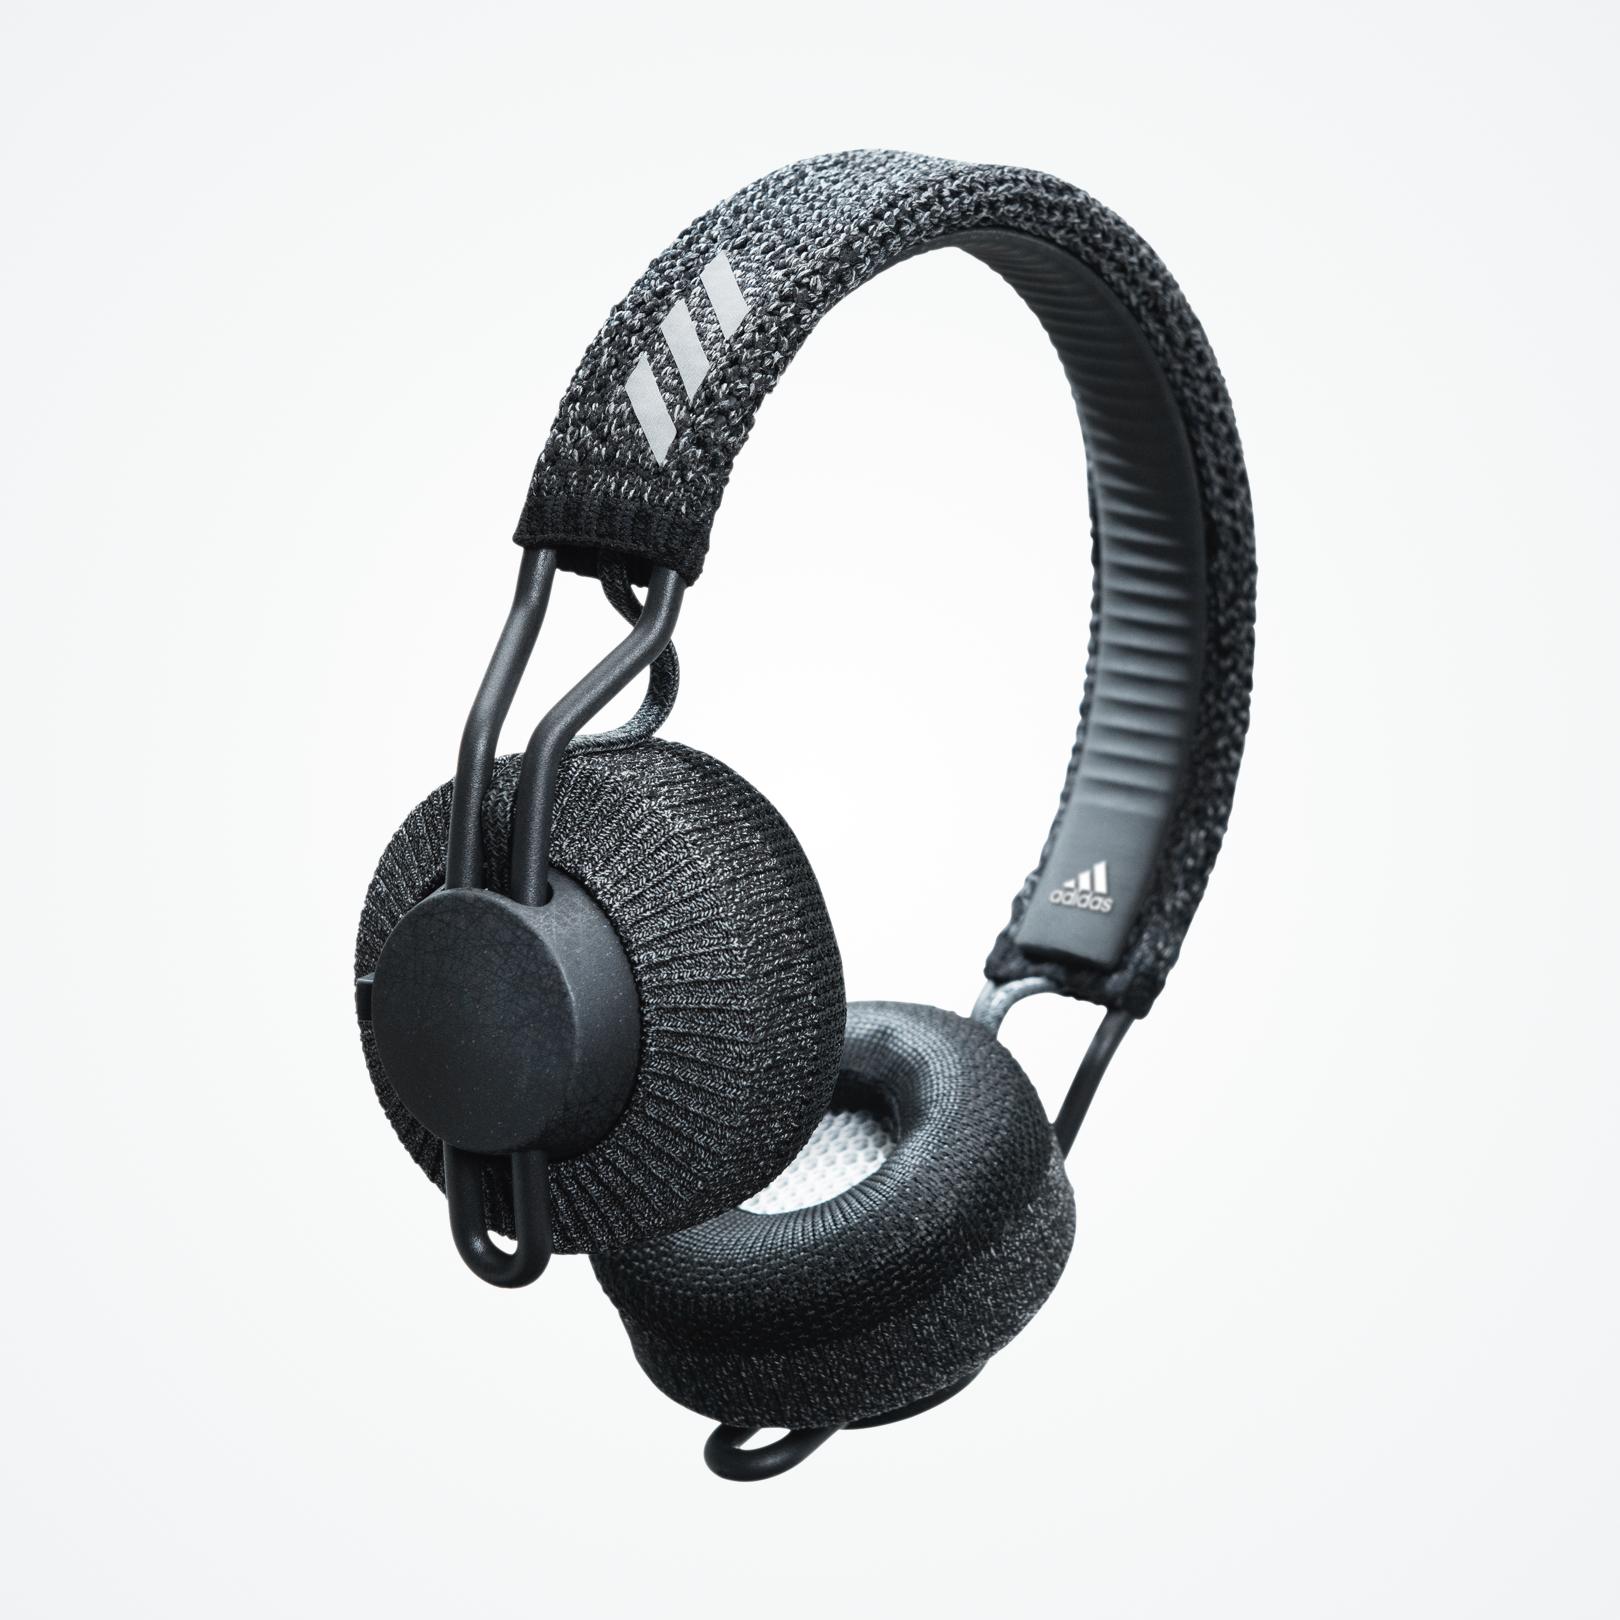 para justificar Extremo Injusto  RPT-01 Wireless Bluetooth Sport Headphones | adidas